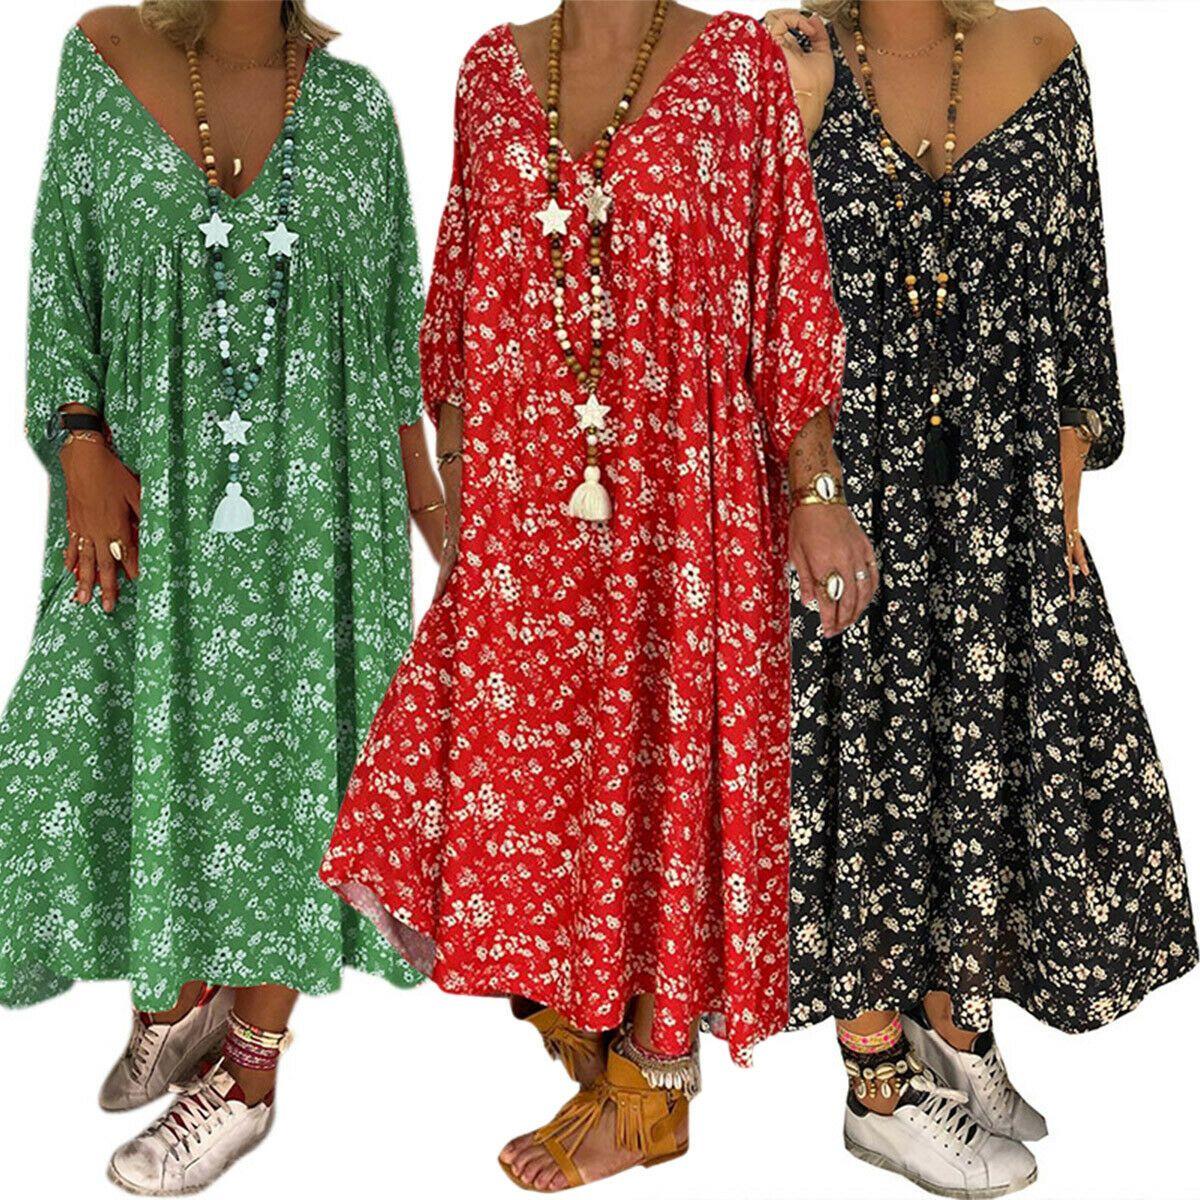 Übergröße Damen Boho Tunikakleid Kaftan Freizeitkleid Strand Retro Longtop Kleid